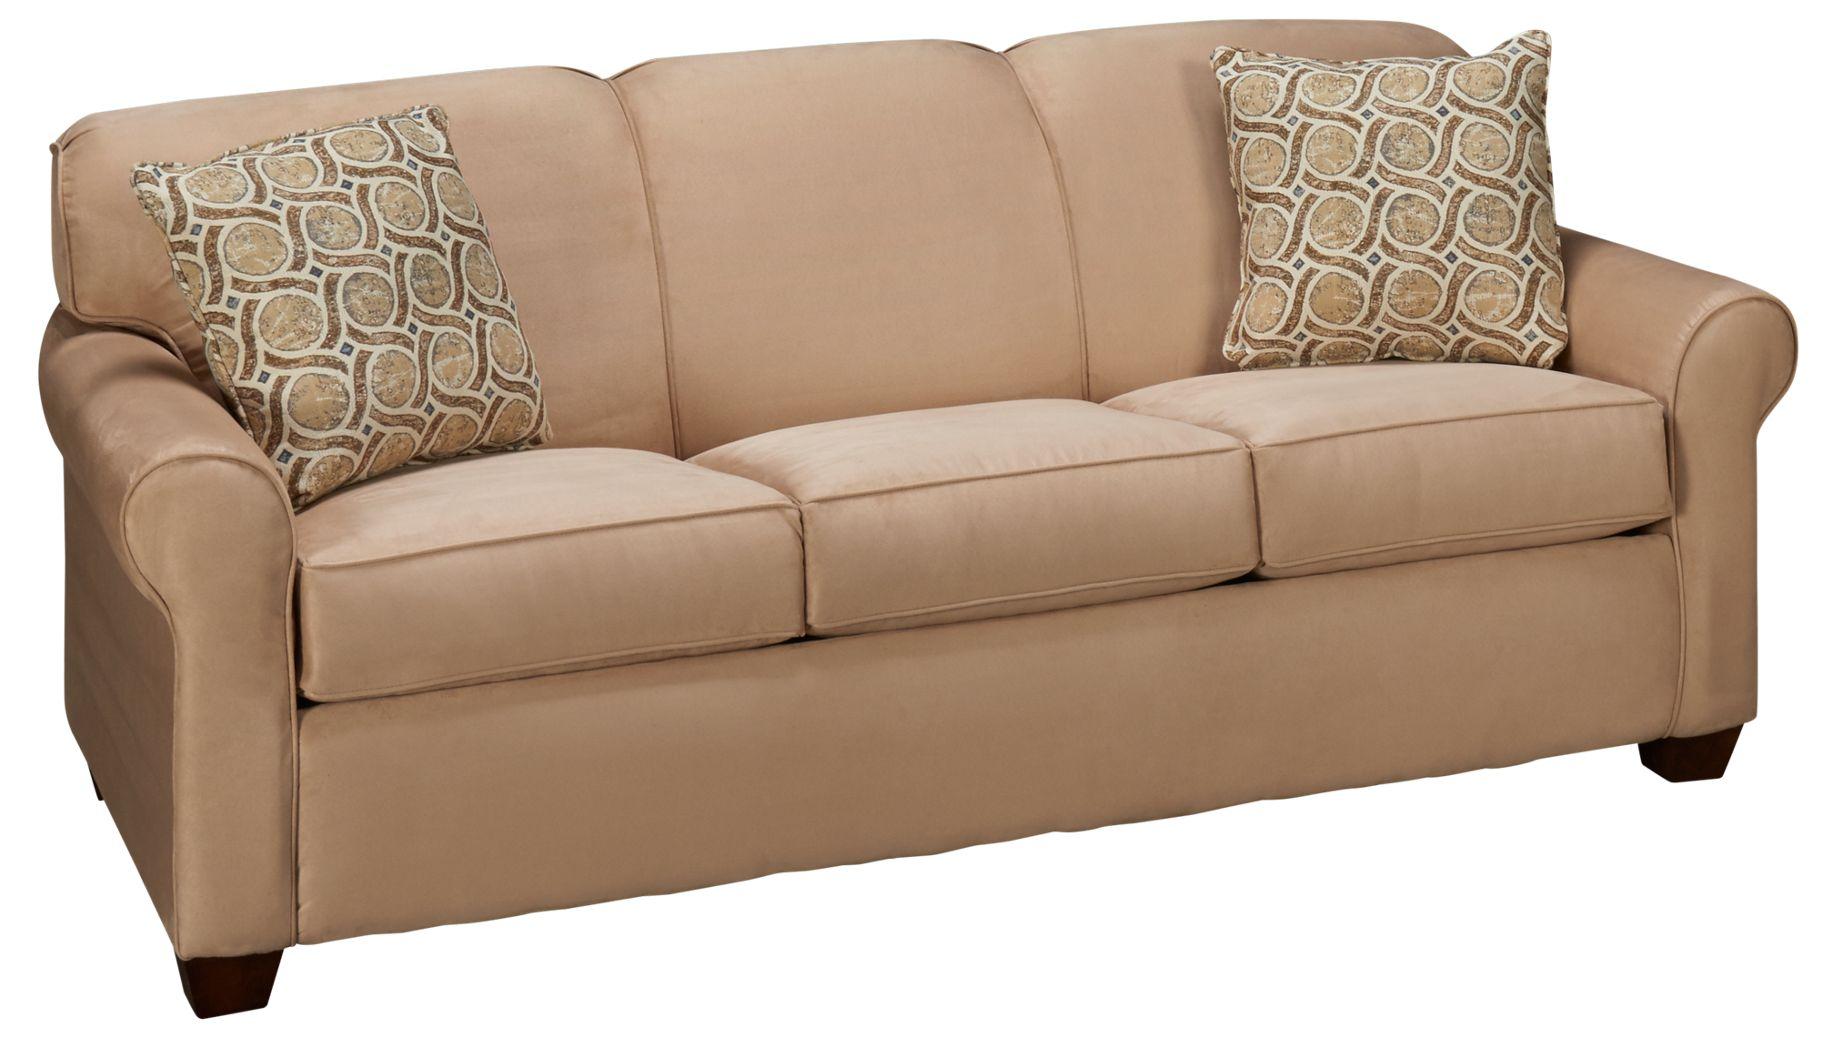 Klaussner Sleeper Sofa With Air Mattress Refil Sofa